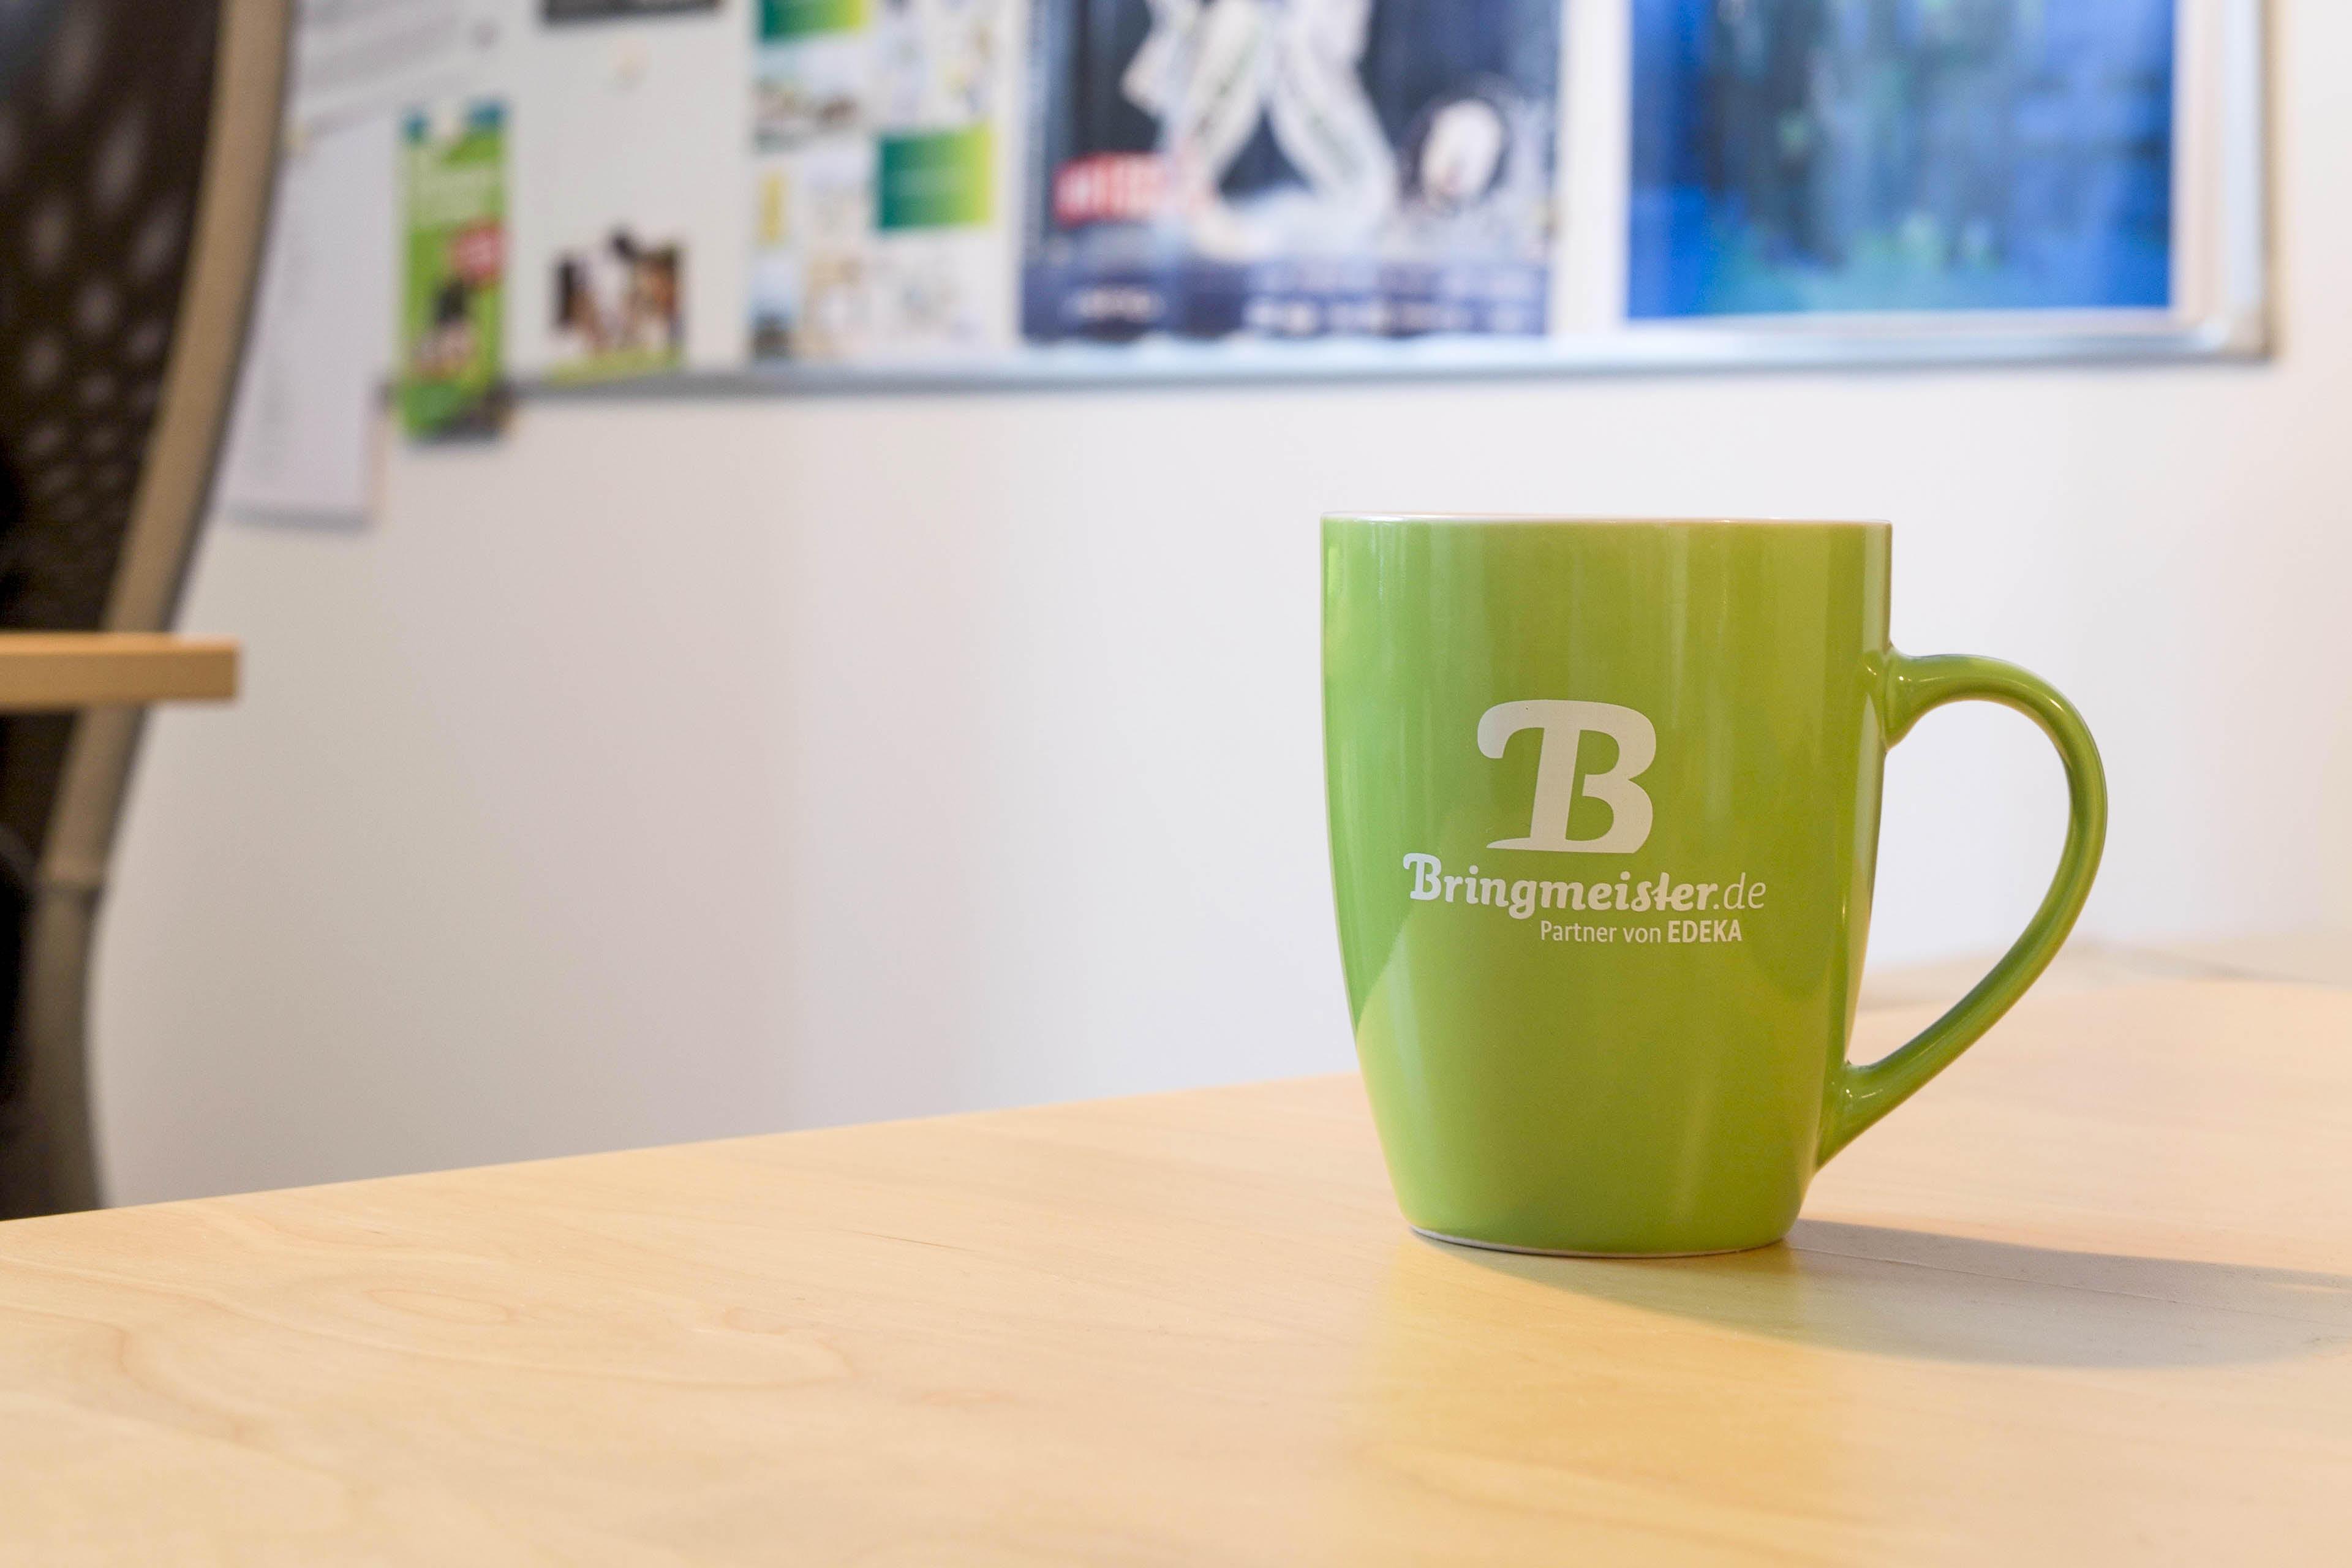 Bringmeister Office